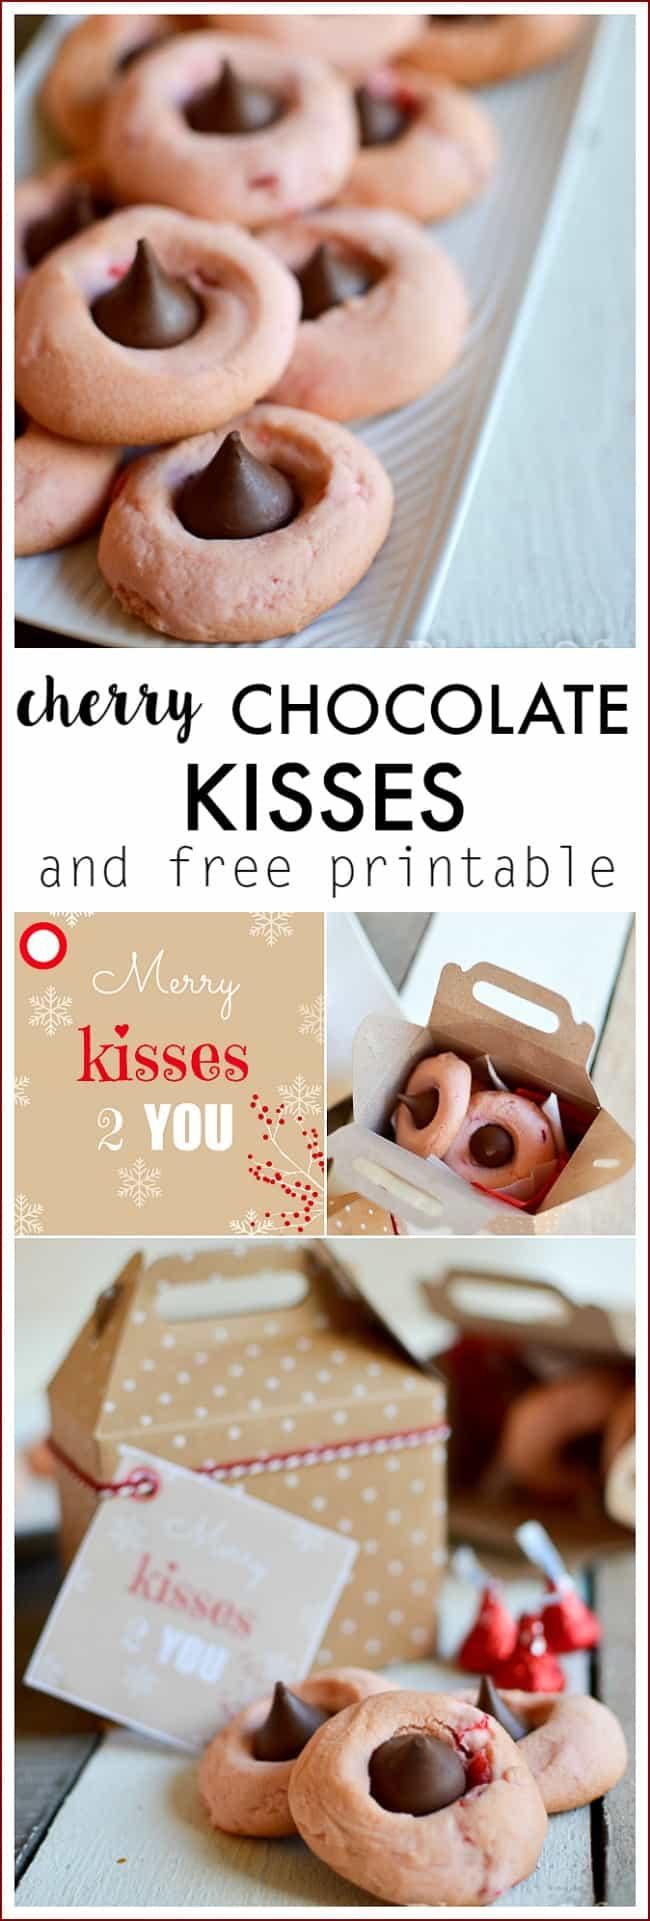 Cherry Chocolate kisses and free printable